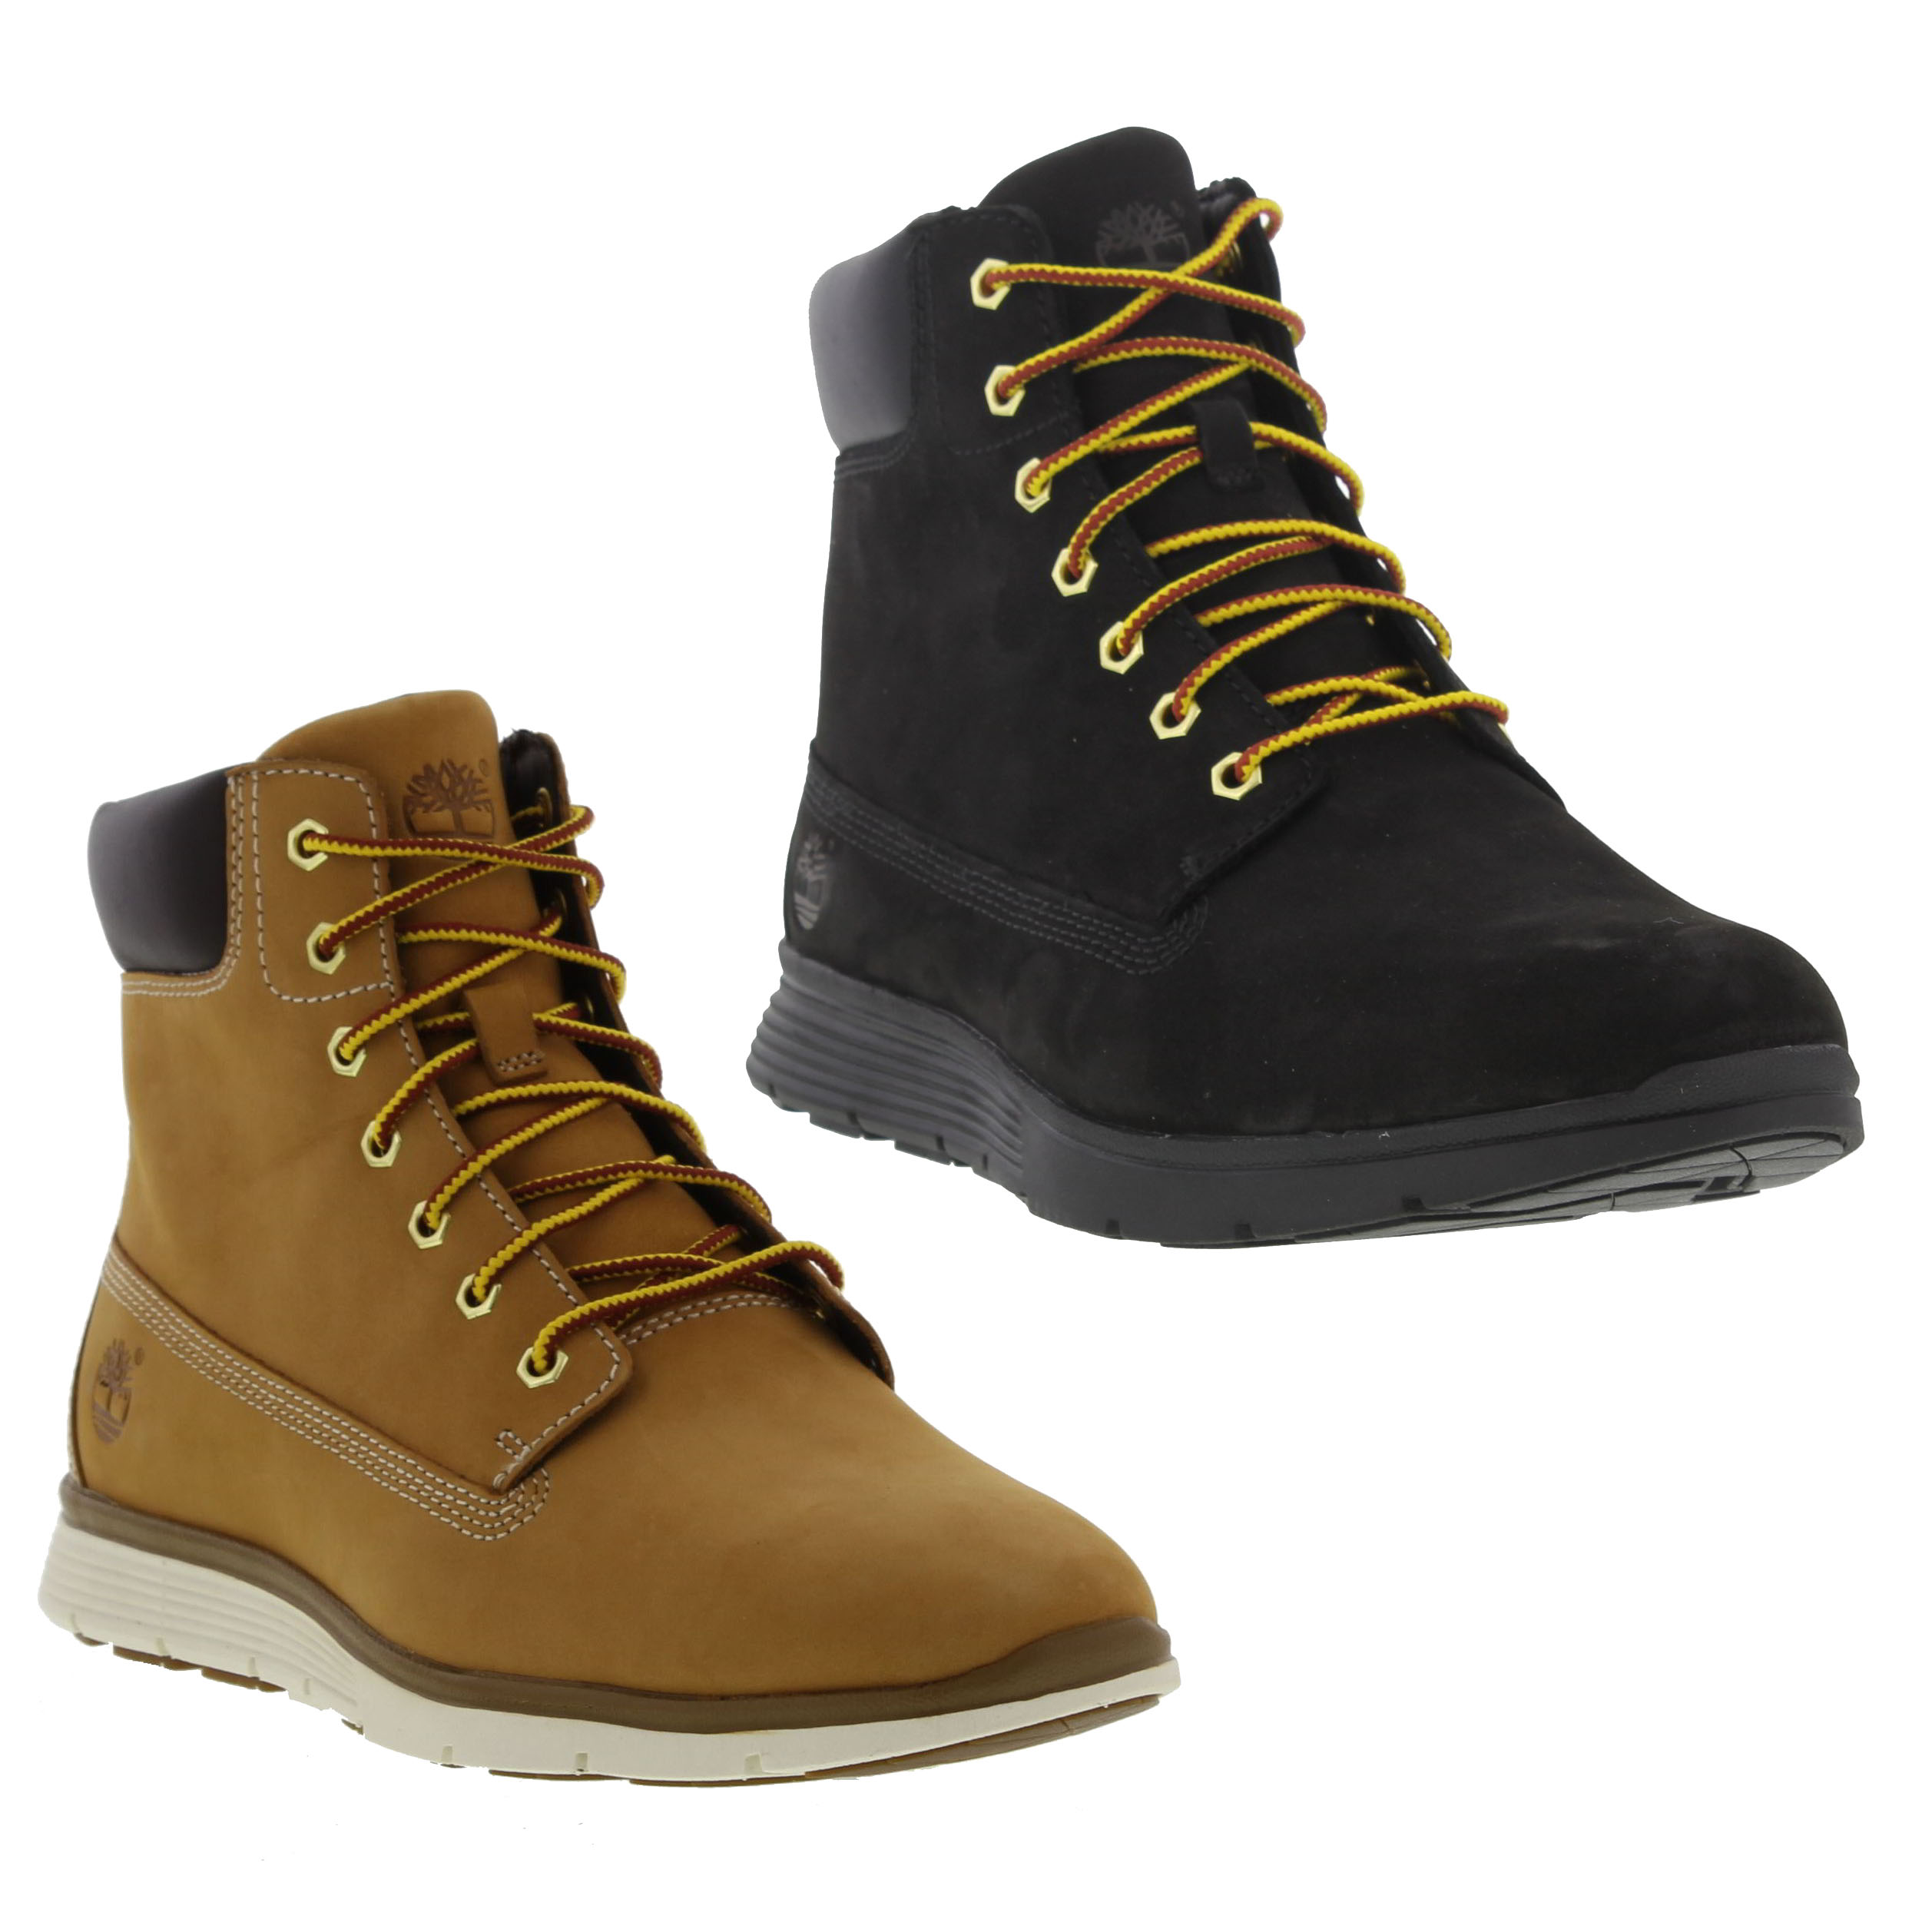 50fb6a55fbe1f Timberland Killington 6 Inch Mens Black Wheat Leather Boots Size UK ...